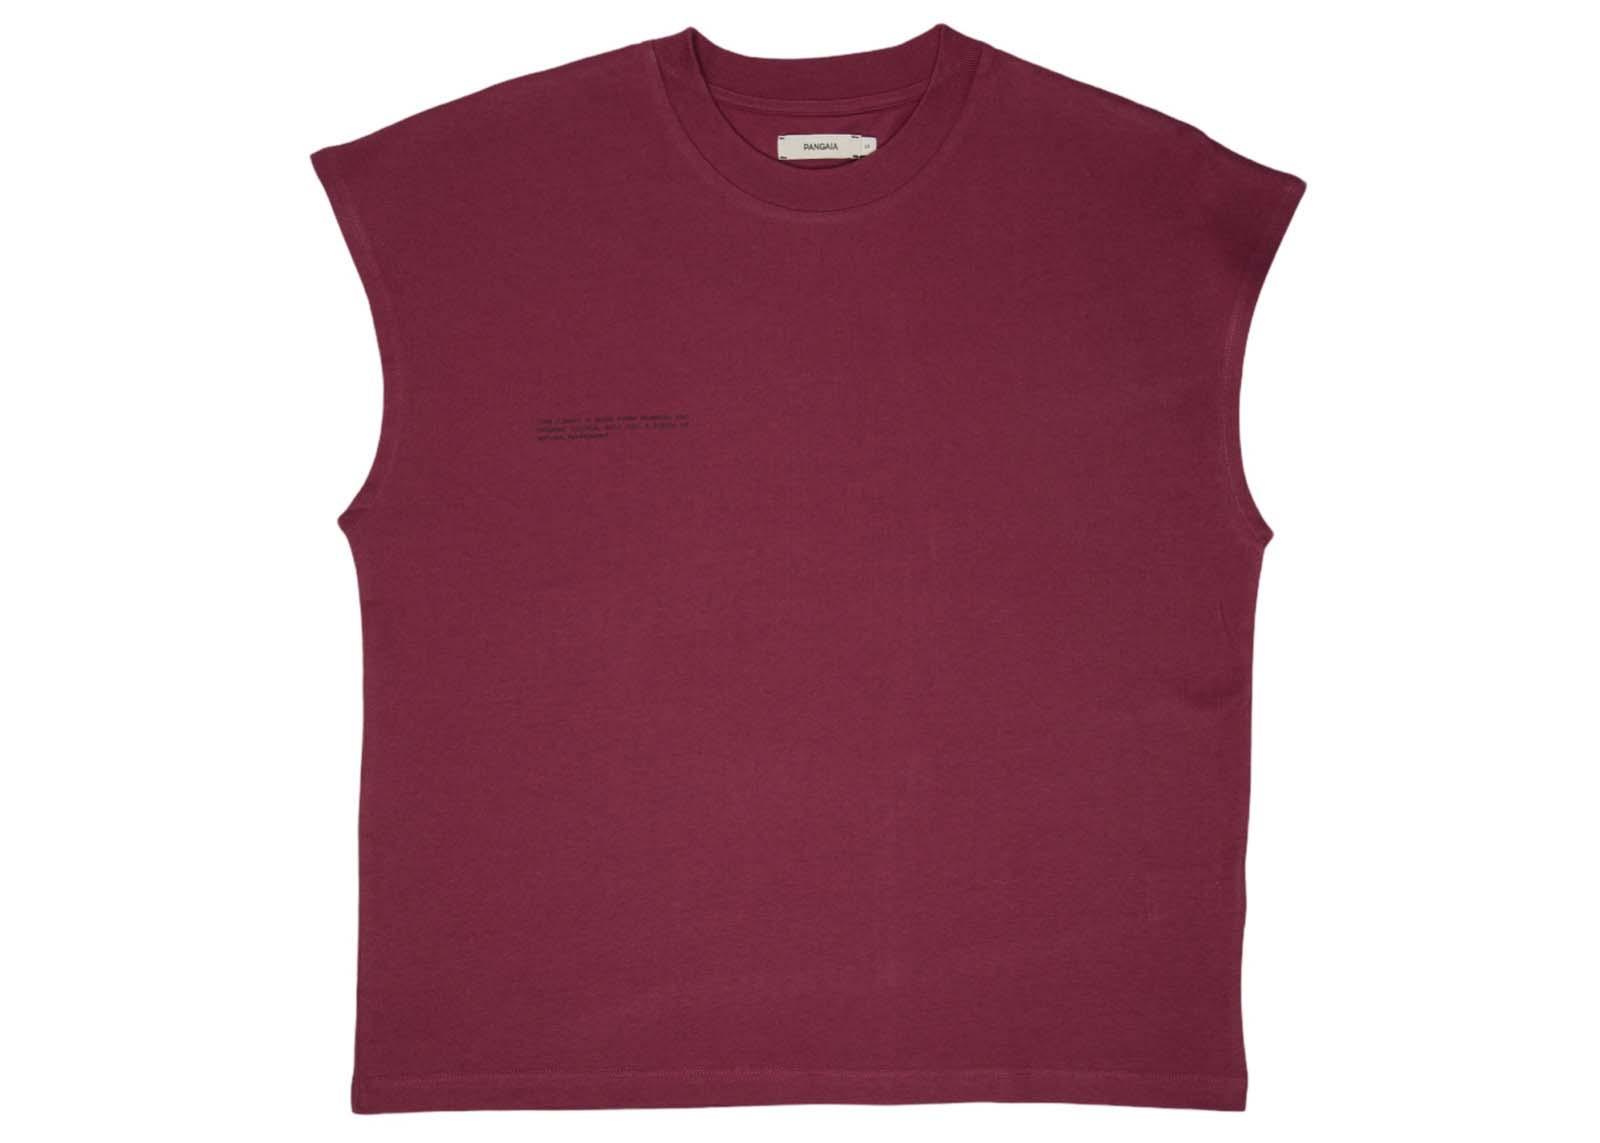 slide 1 - Cropped Shoulder Tshirt - Cherry